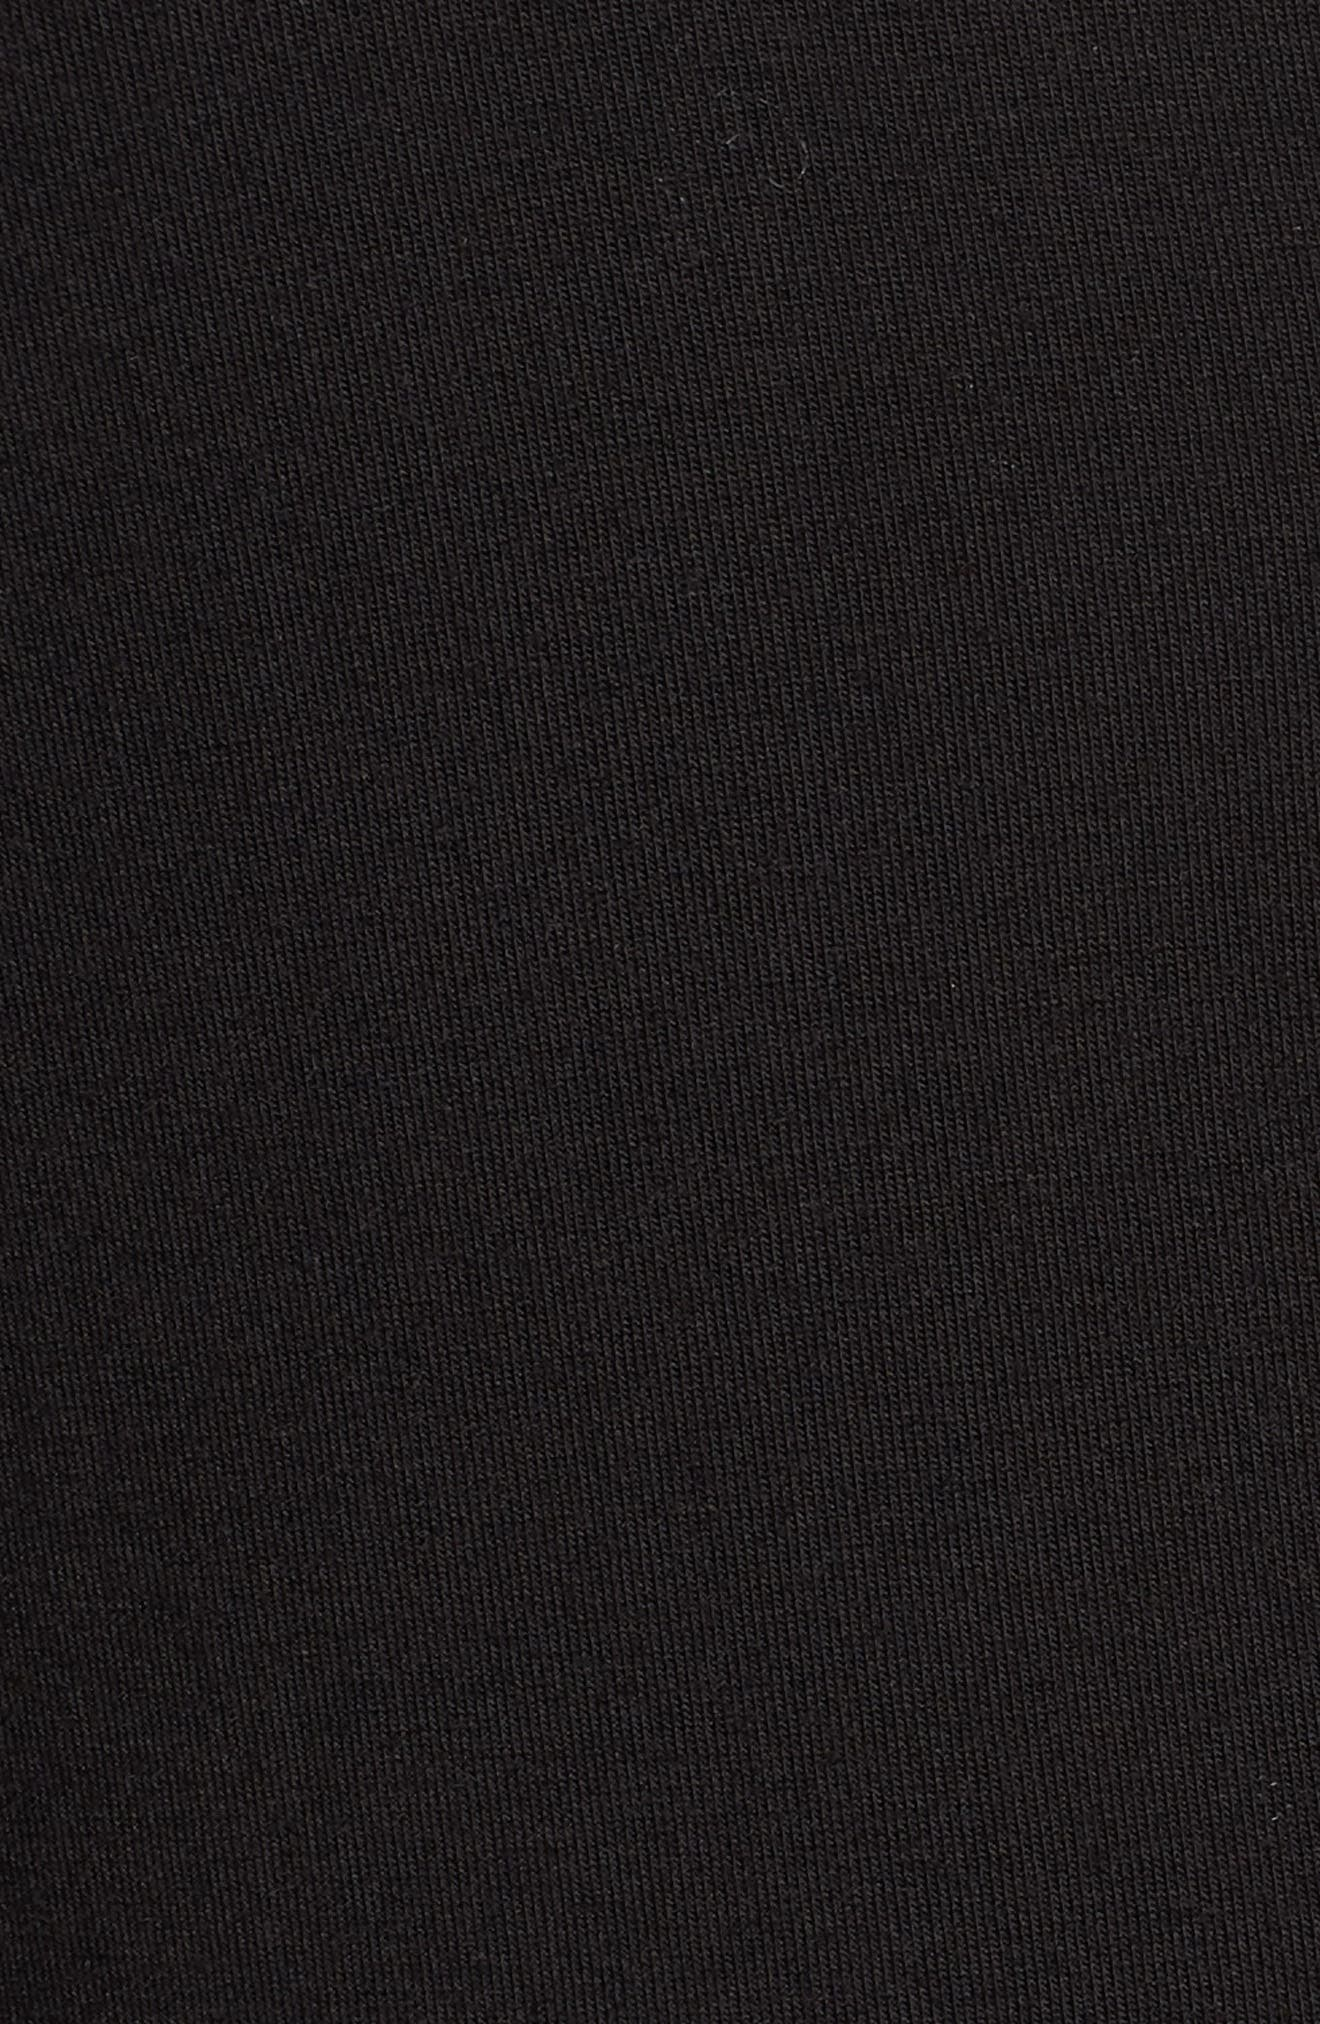 Plunge Tunic,                             Alternate thumbnail 5, color,                             BLACK